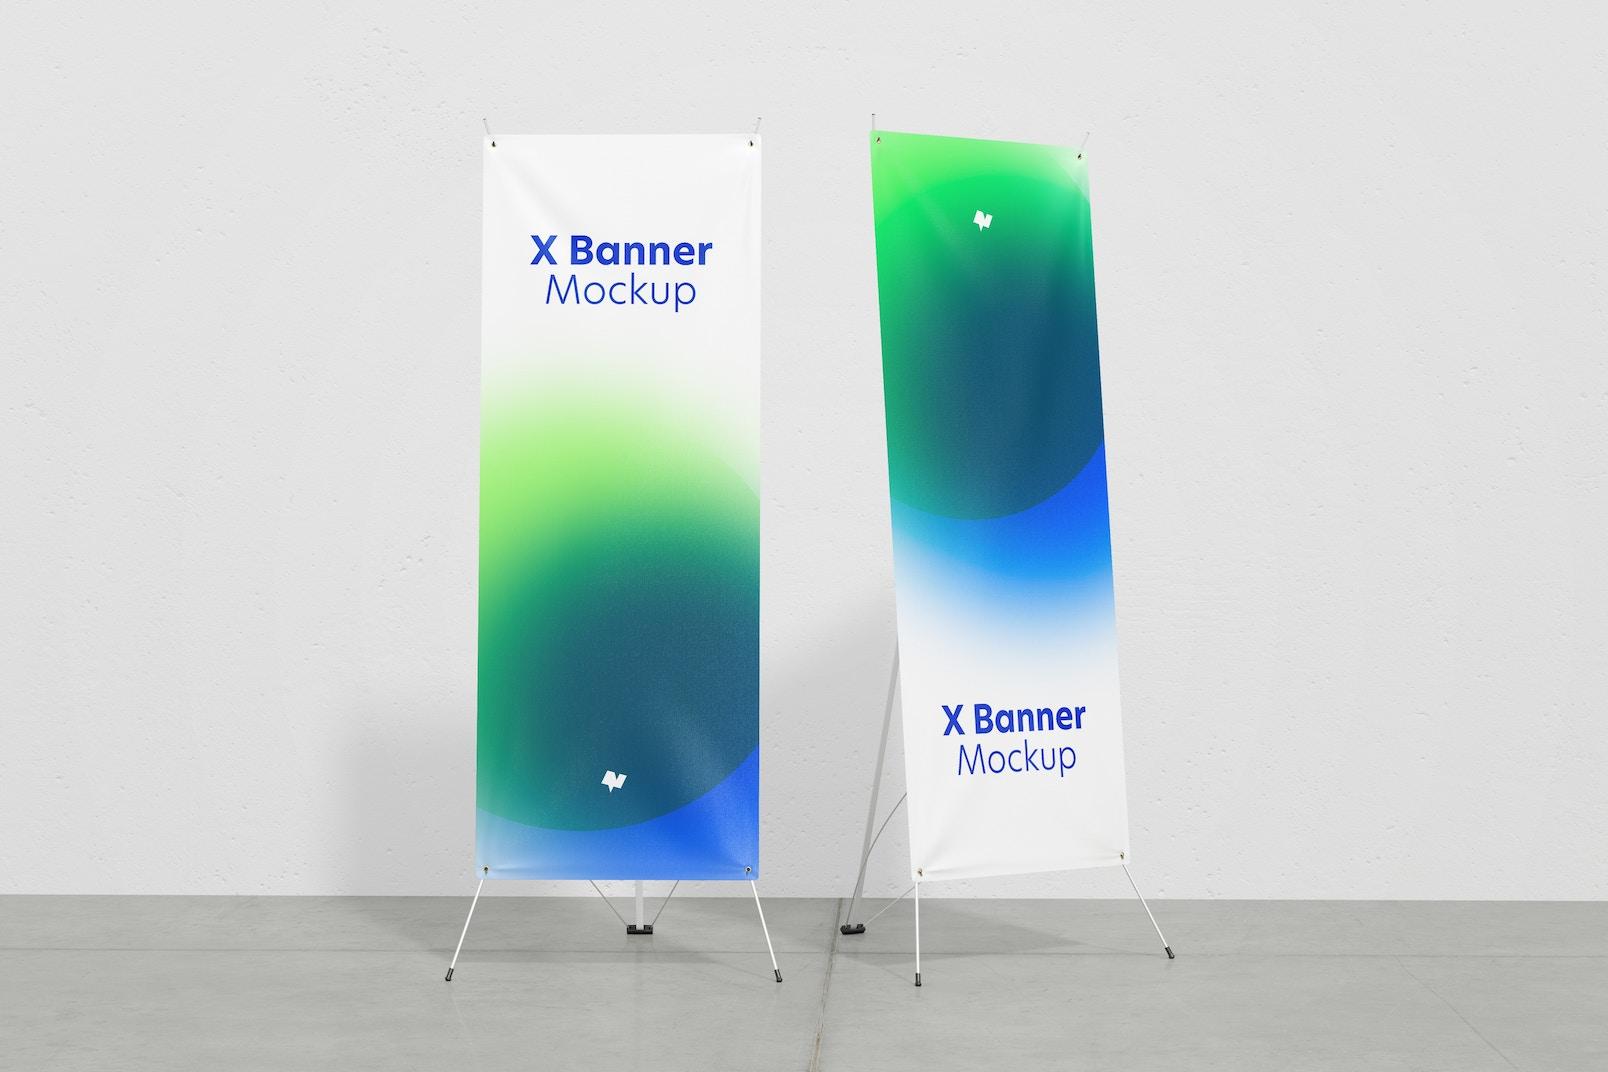 X Banners Mockup